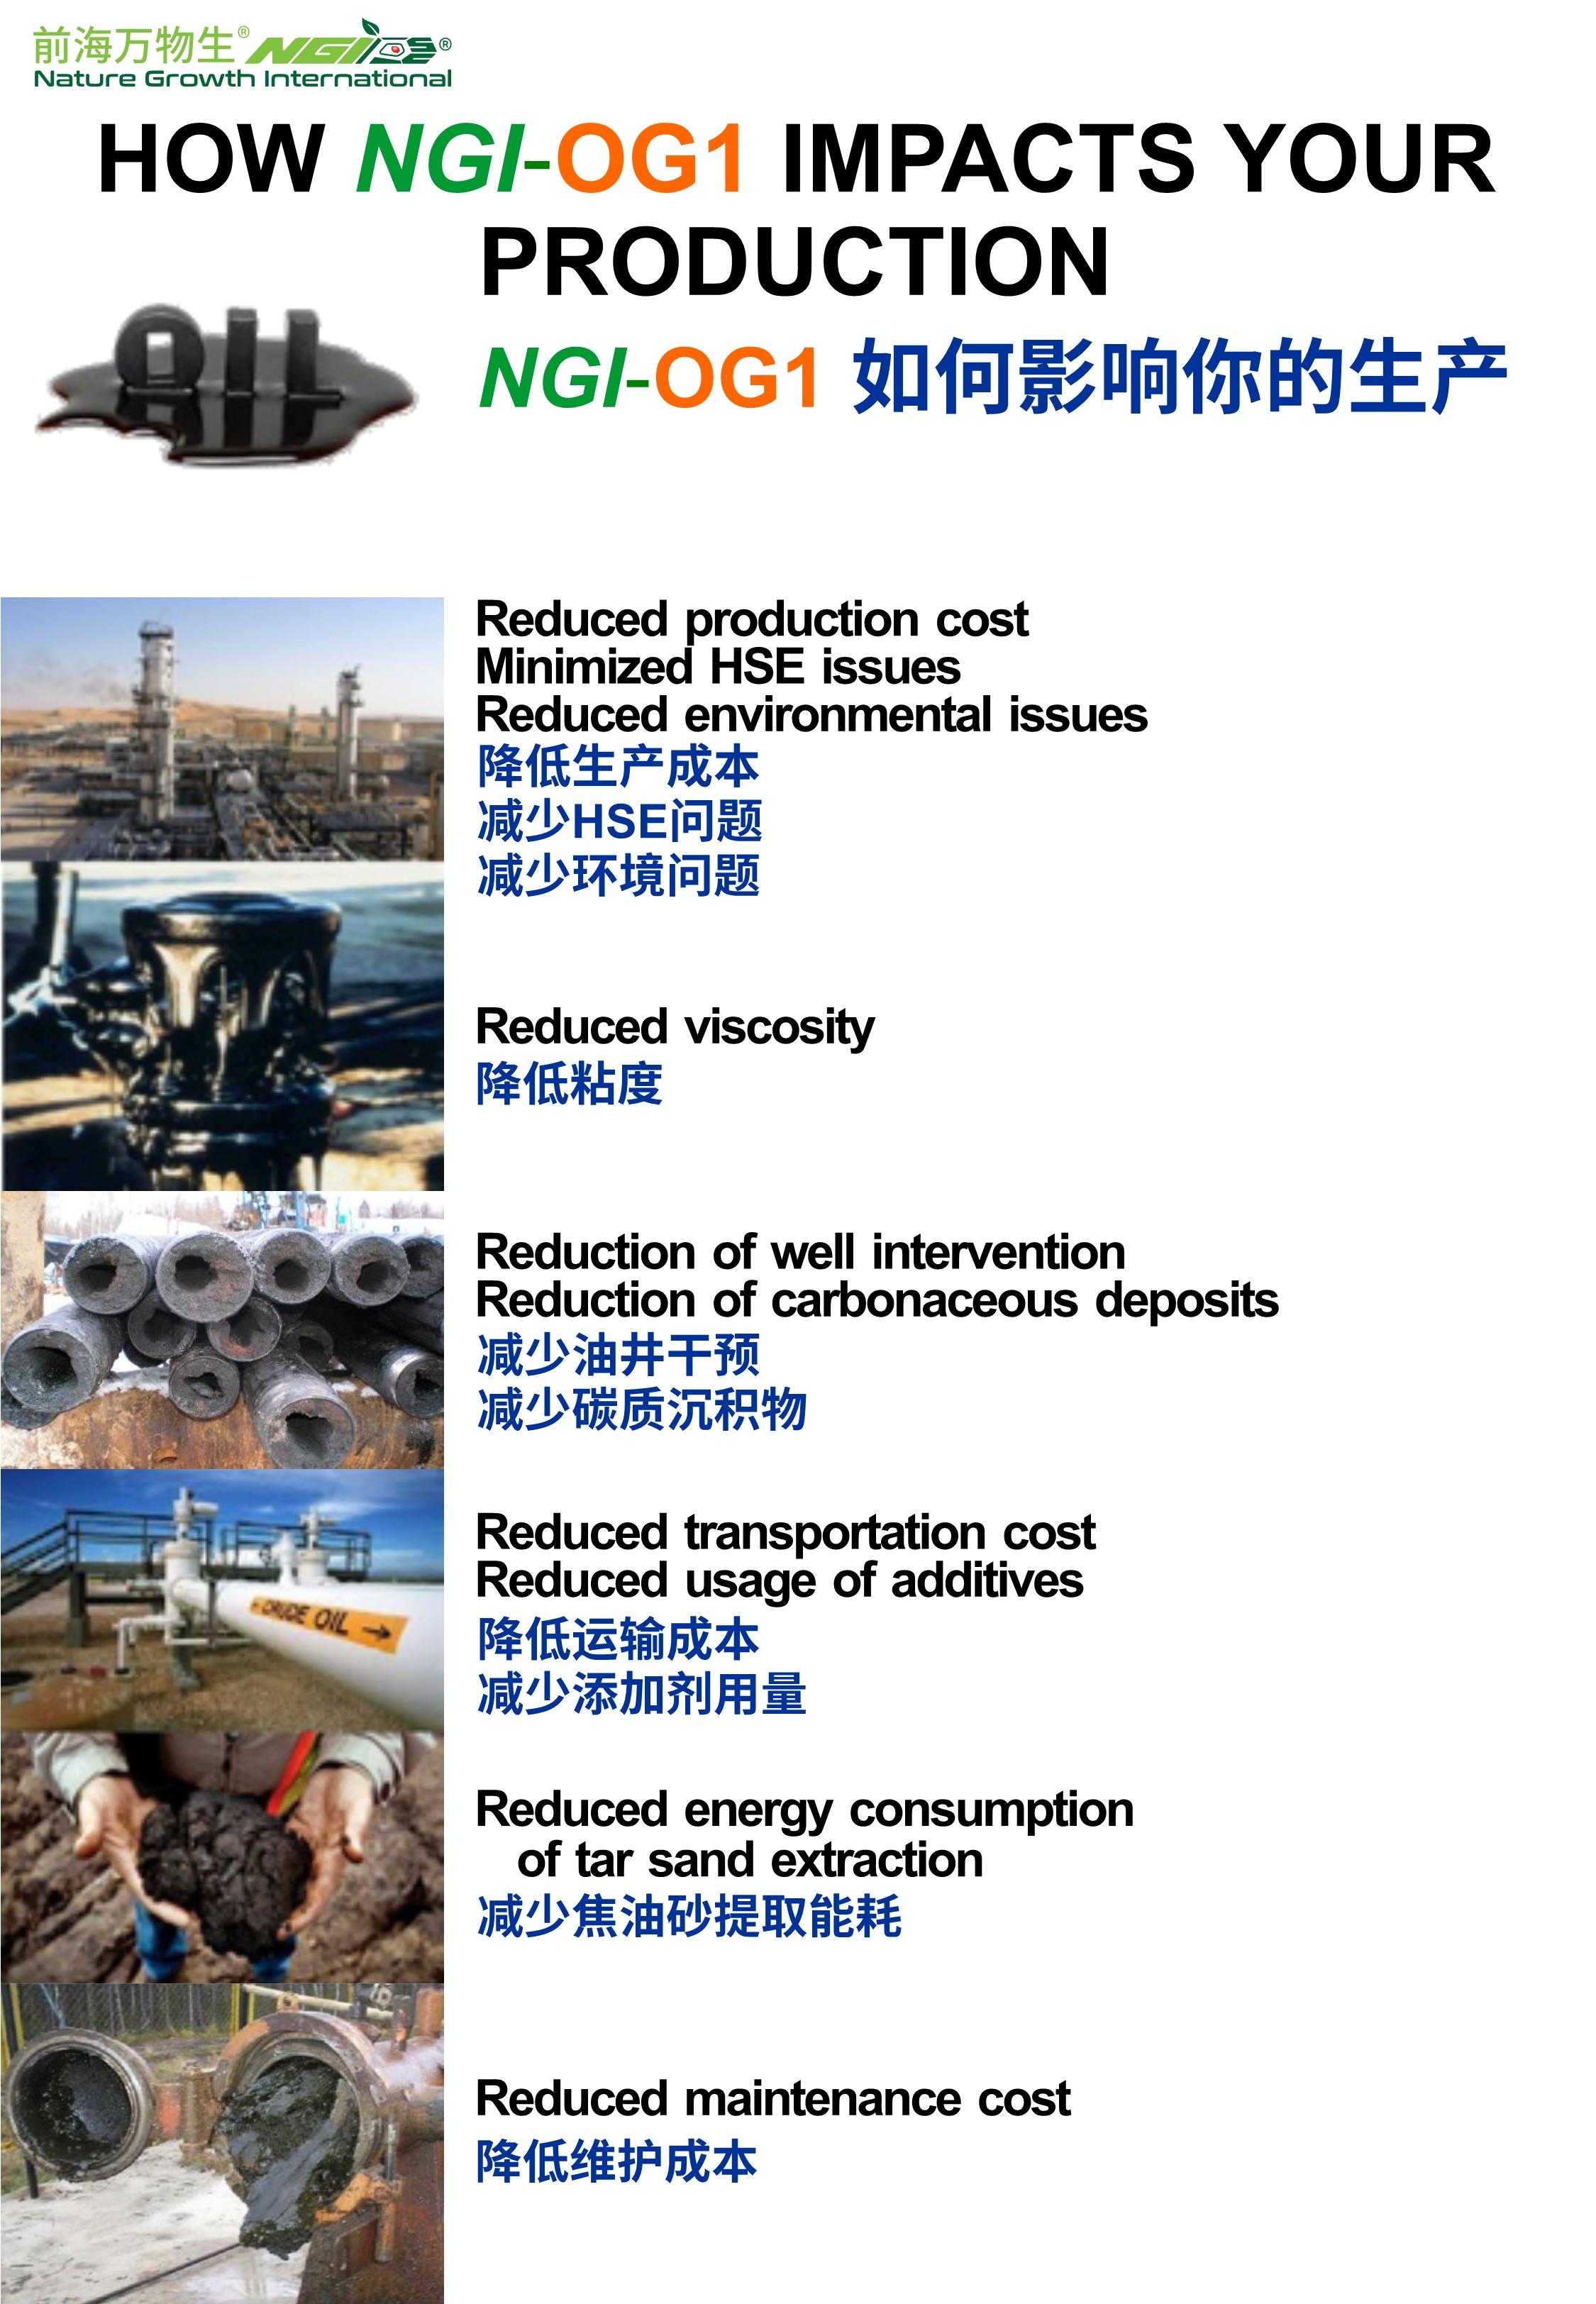 德赢Vwin-生物石油公司NGI-OG1中英20190521v3_jpg-德赢Vwin-生物石油公司NGI-OG1中英20190521v3_16